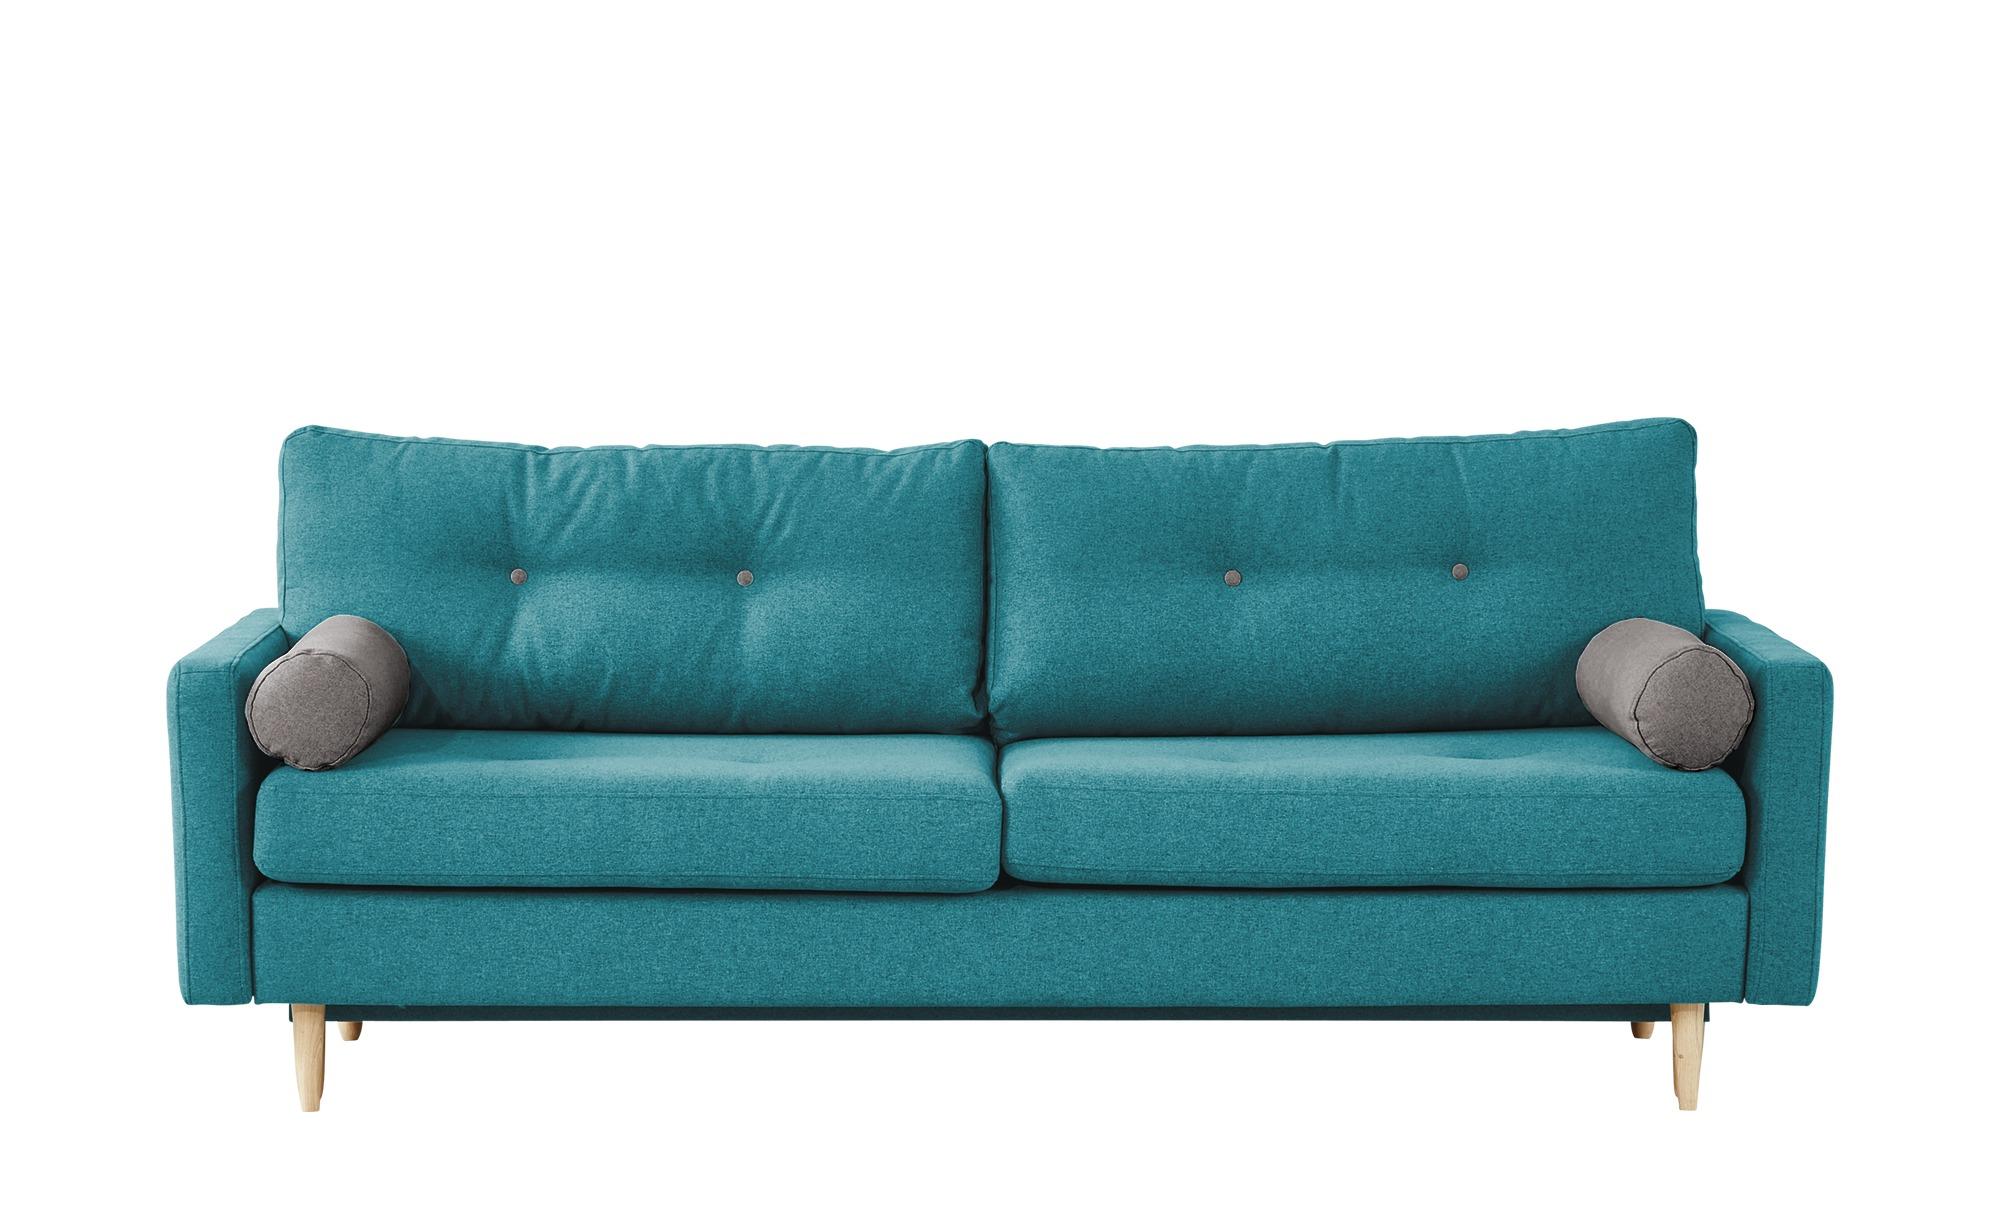 finya Design-Schlafsofa 3-sitzig türkis - Webstoff Pure ¦ türkis/petrol ¦ Maße (cm): B: 218 H: 85 T: 93 Polstermöbel > Sofas > 3-Sitzer - Höffner